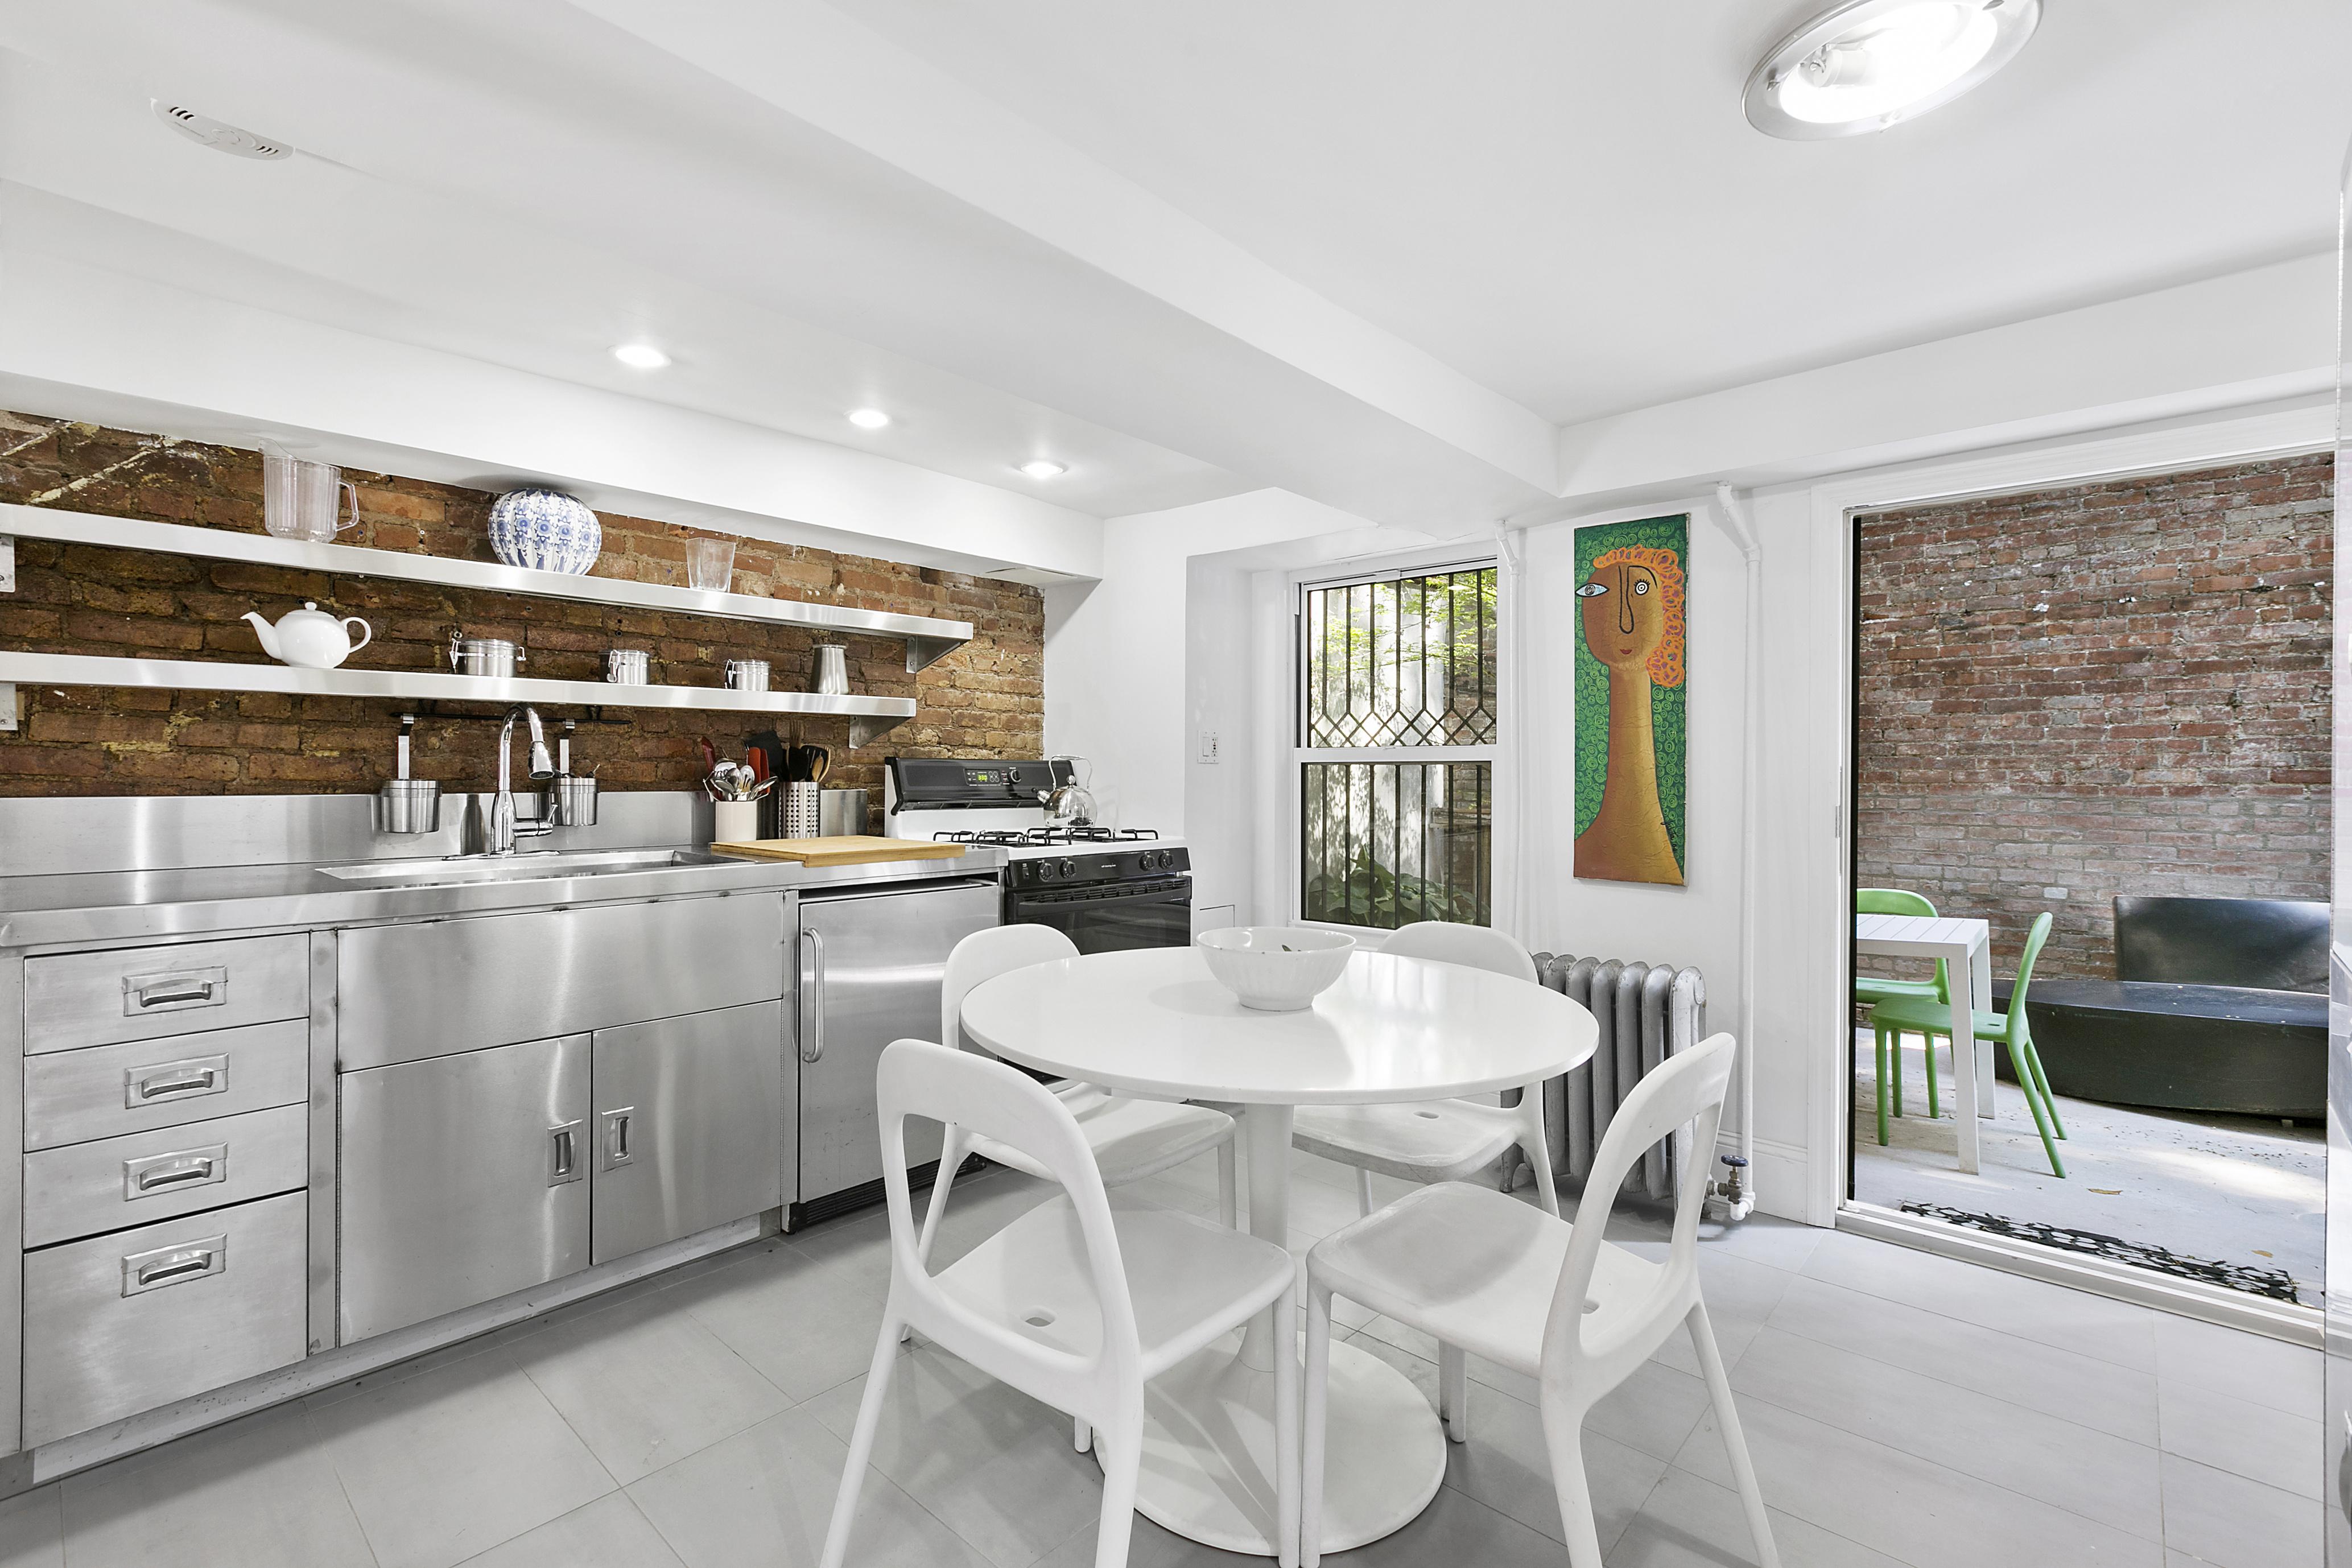 For $1.575M, a quaint townhouse on hidden Sylvan Terrace - Curbed NY